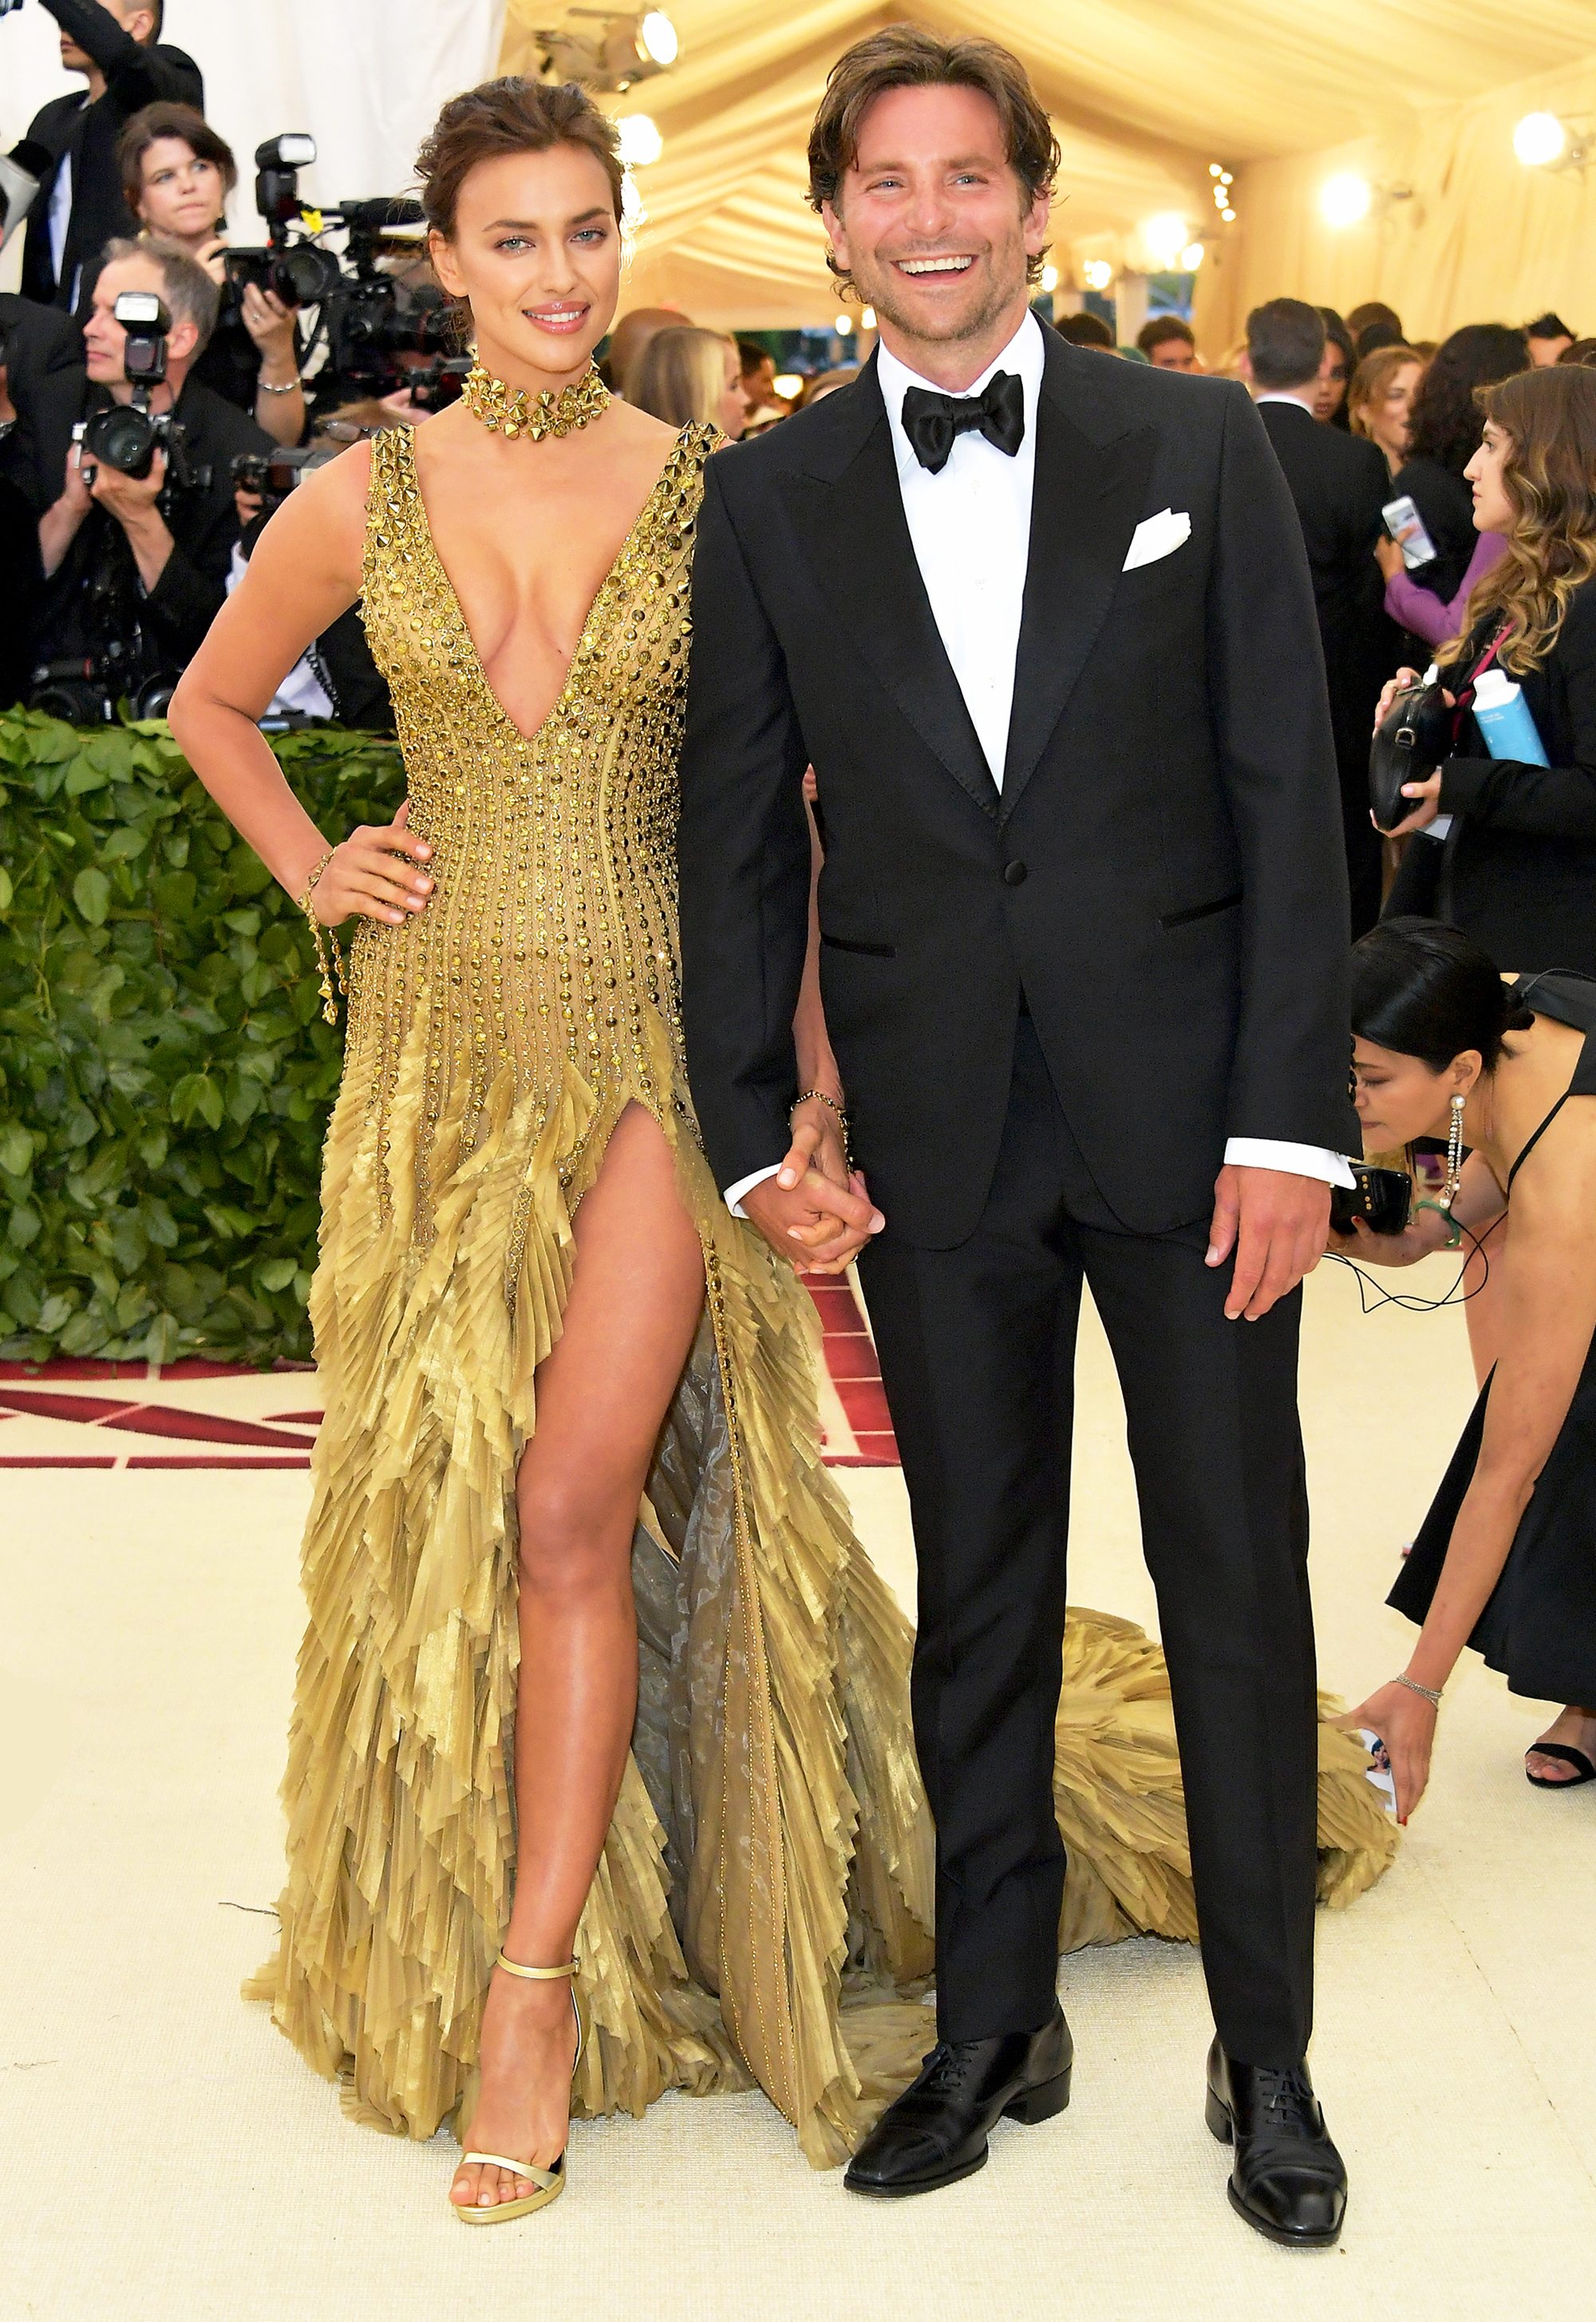 Bradley Cooper Irina Shayk Make Rare Appearance At Met Gala Photo